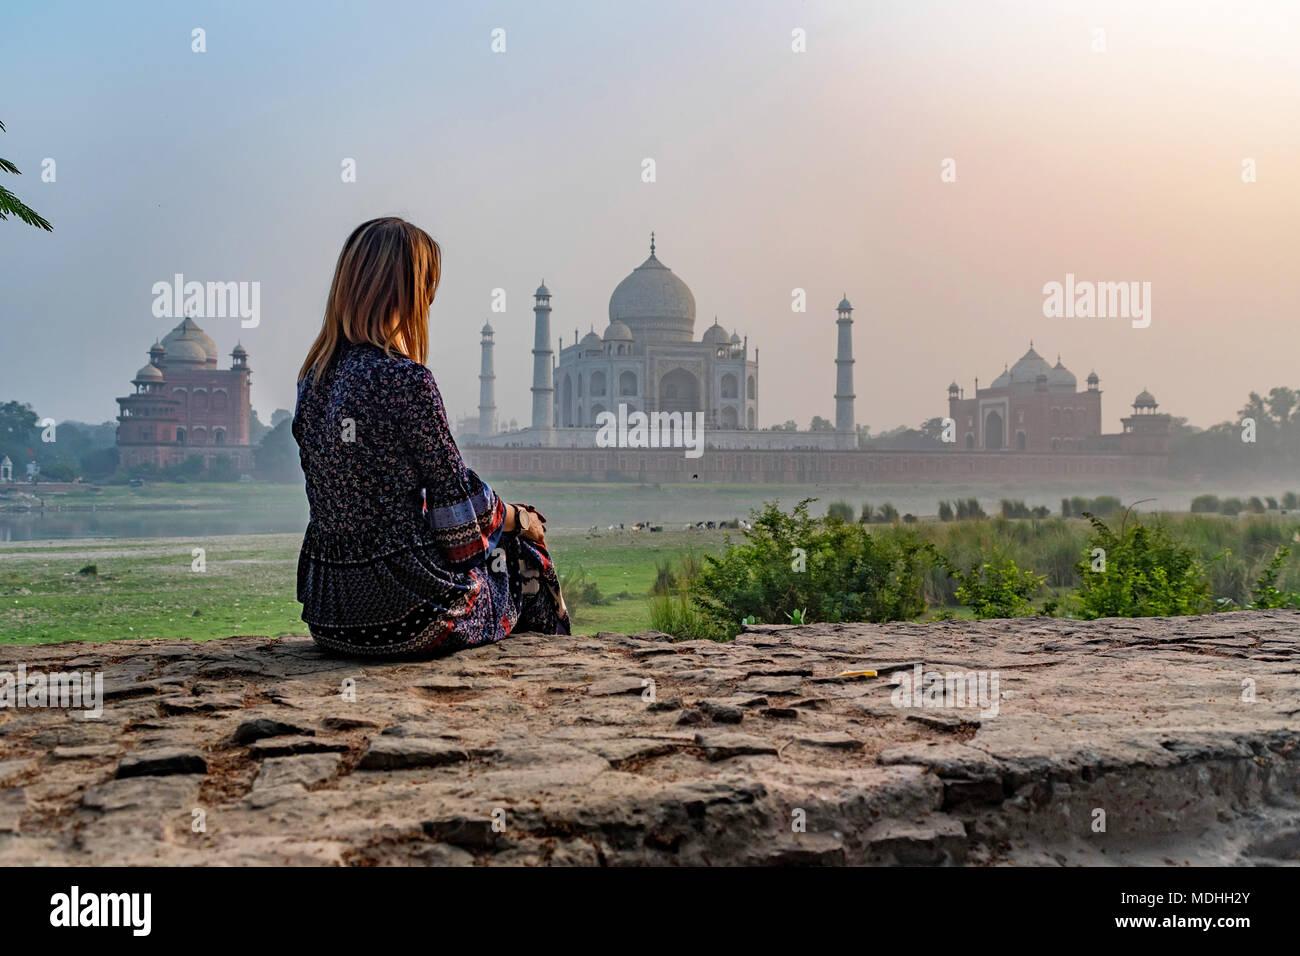 Schöne Mädchen schaut im Taj Mahal. Travel Concept Stockbild